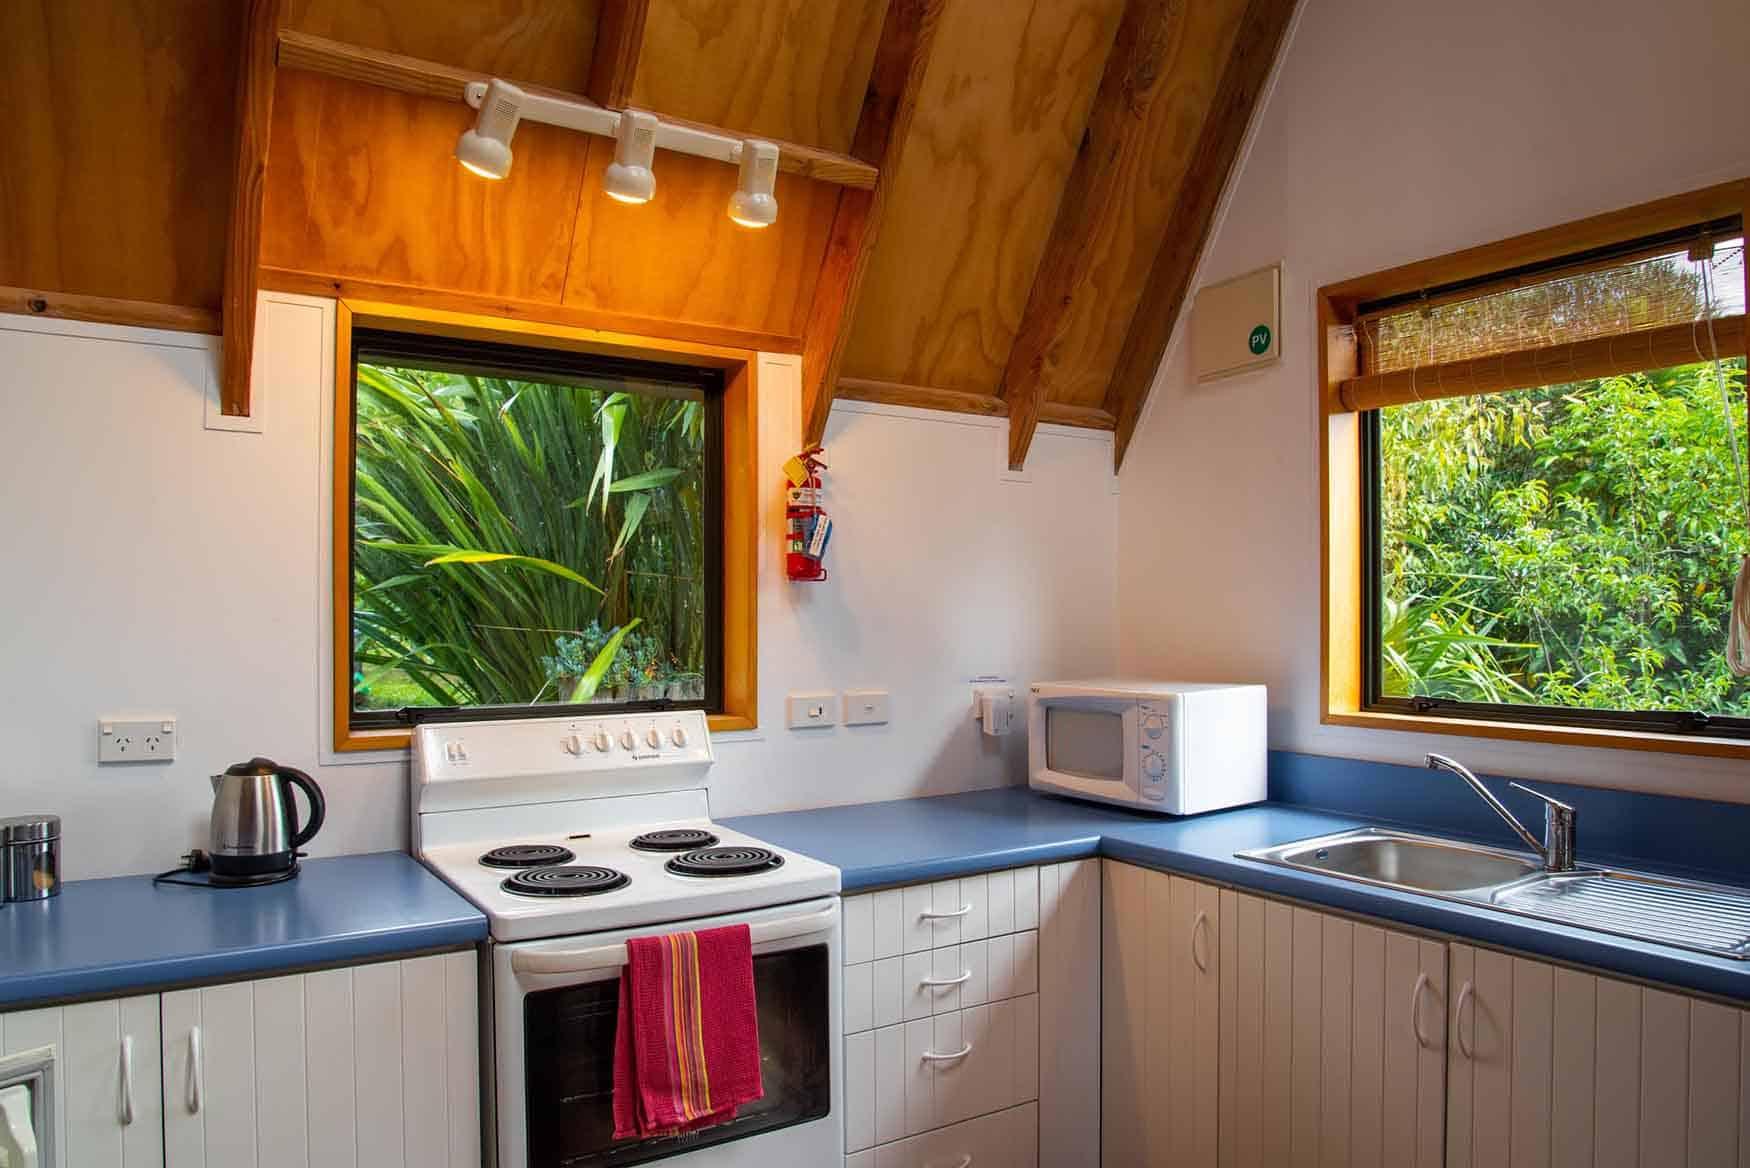 Kitchen of Fantail cottage accommodation in Dunedin